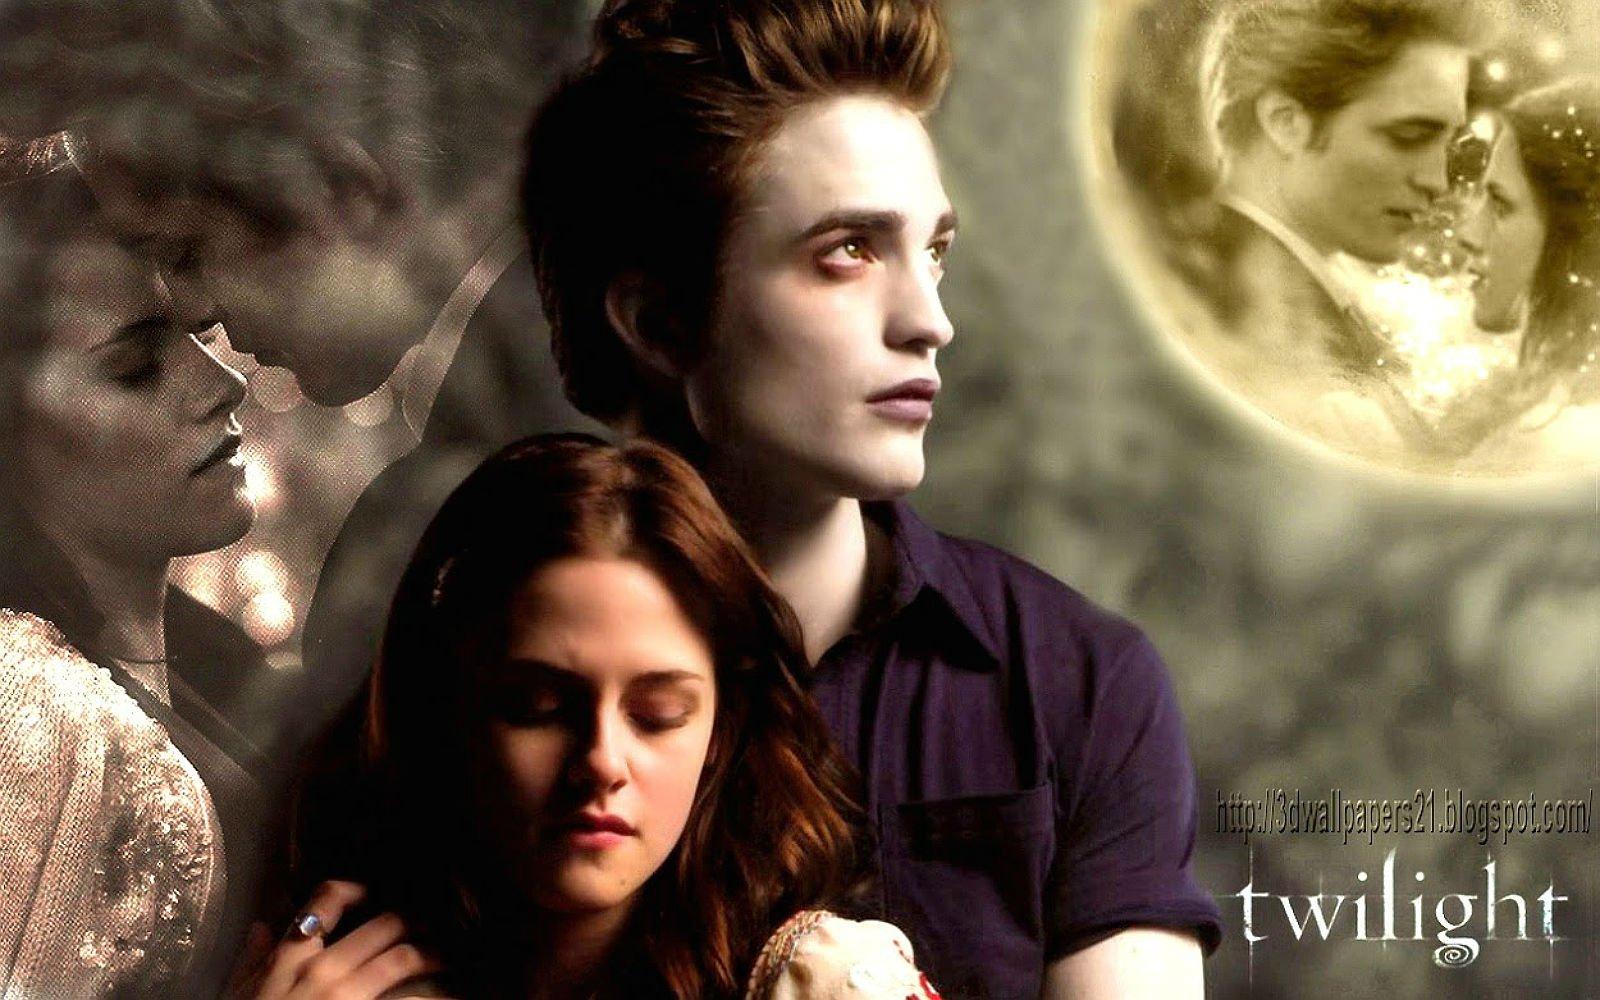 TWILIGHT drama romance vampire werewolf fantasy series ...